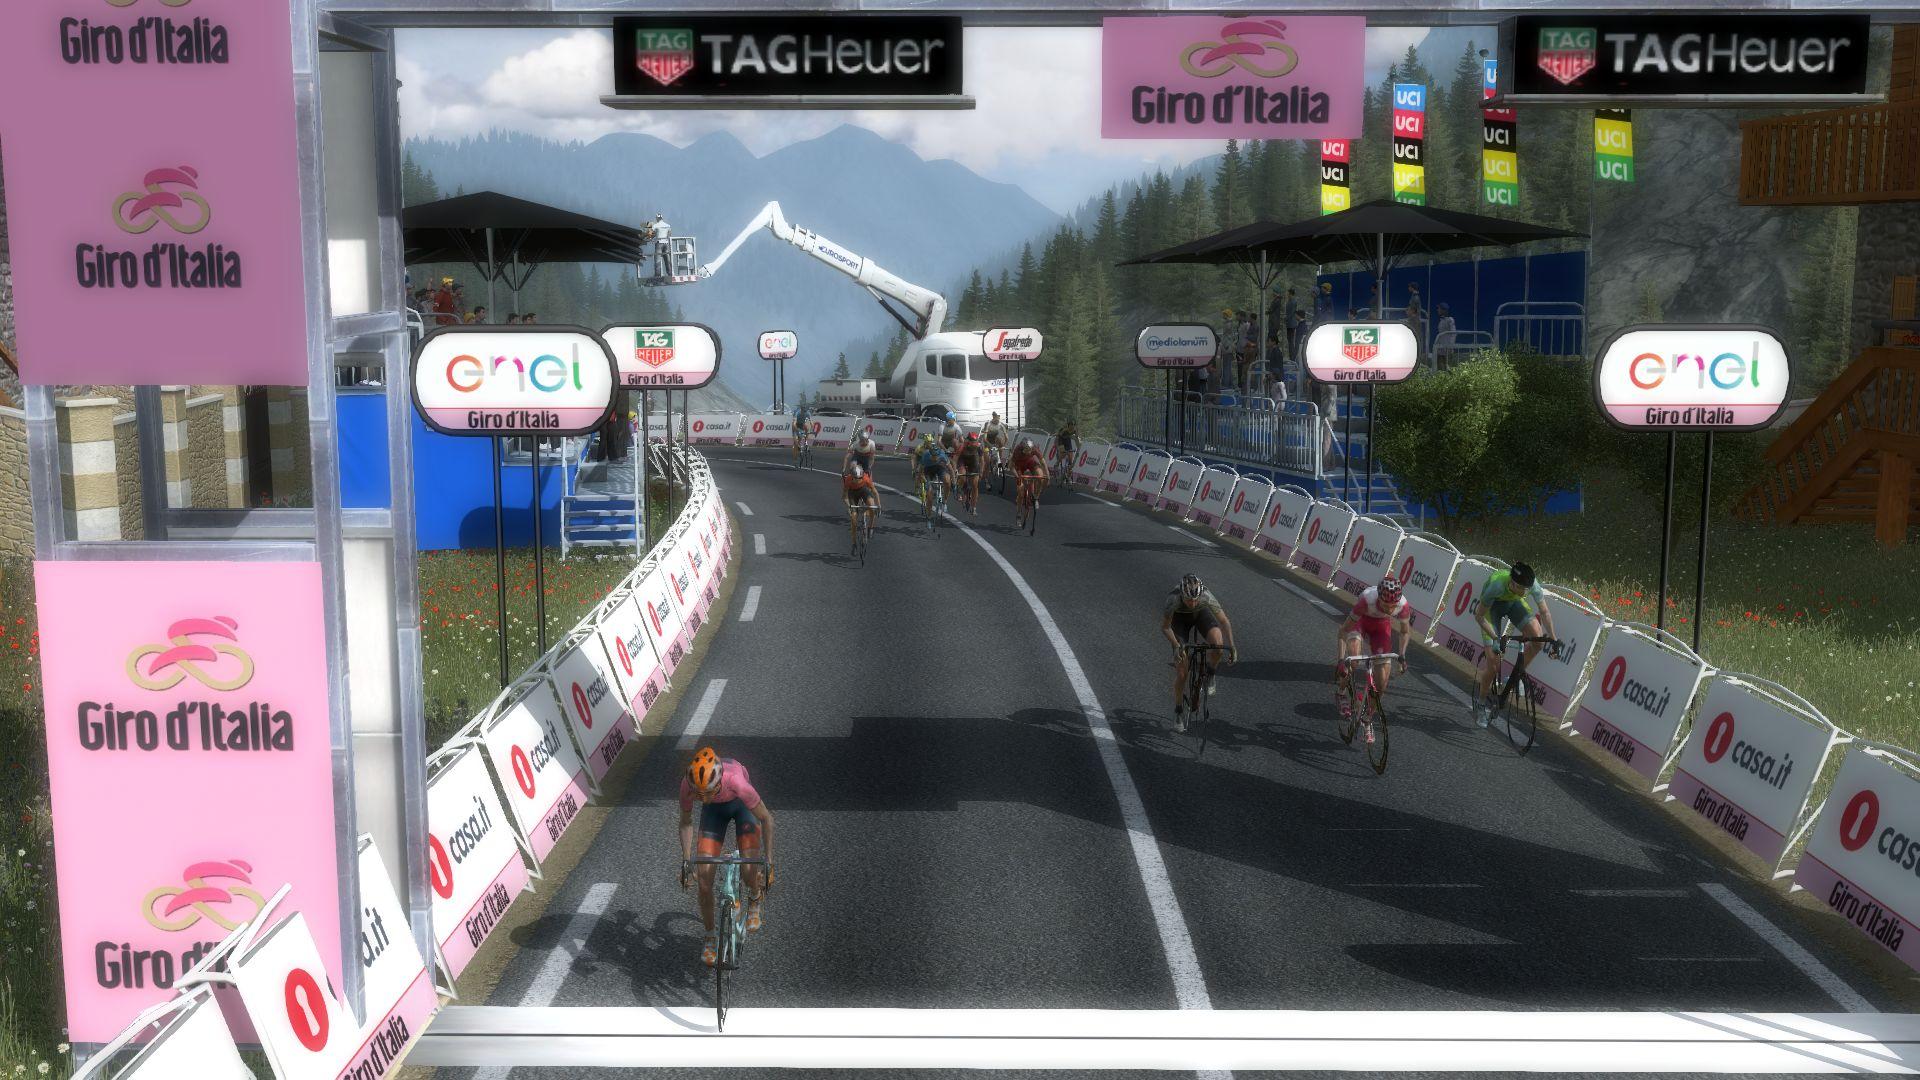 pcmdaily.com/images/mg/2020/Reports/GTM/Giro/S20/mg20_giro_s20_087.jpg